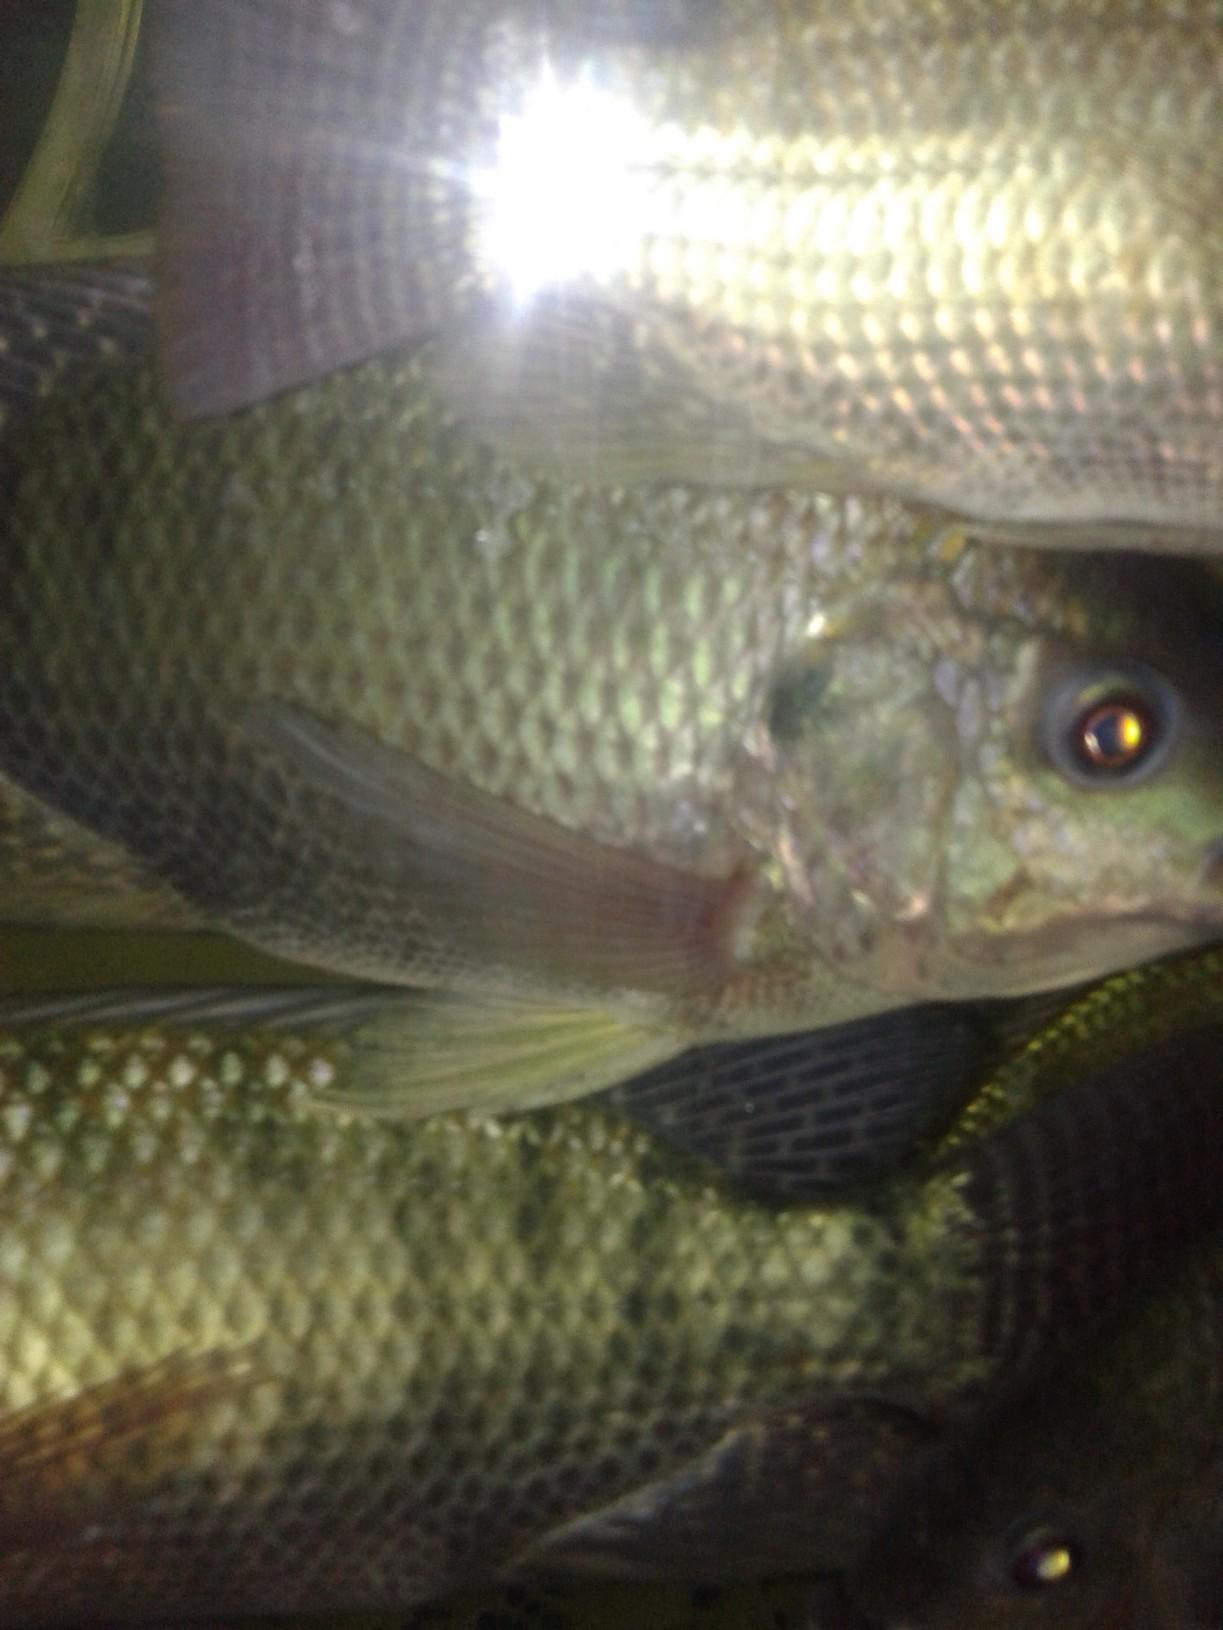 Aquaponics breeding tilapia save green going green for Tilapia aquaponics